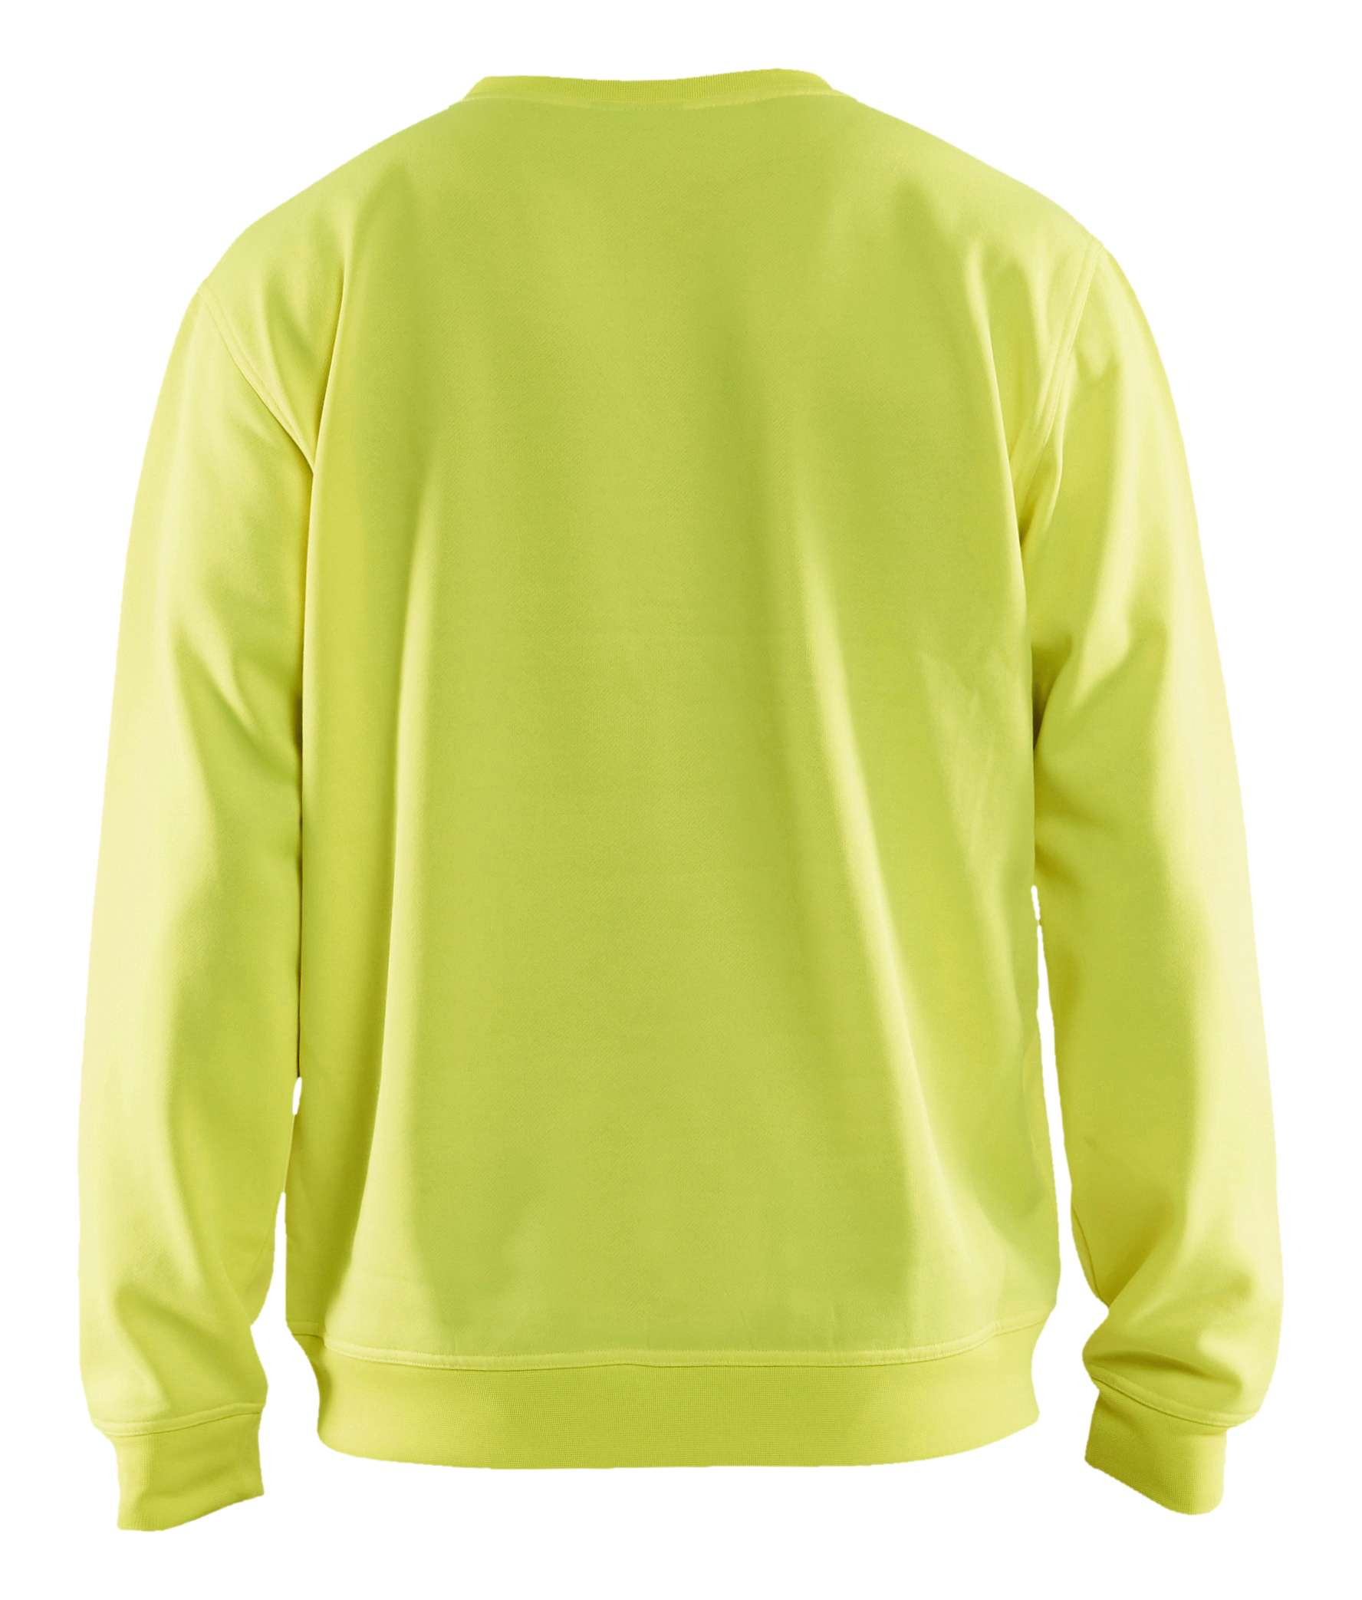 Blaklader Sweatshirts 34011074 High Vis fluo-geel(3300)